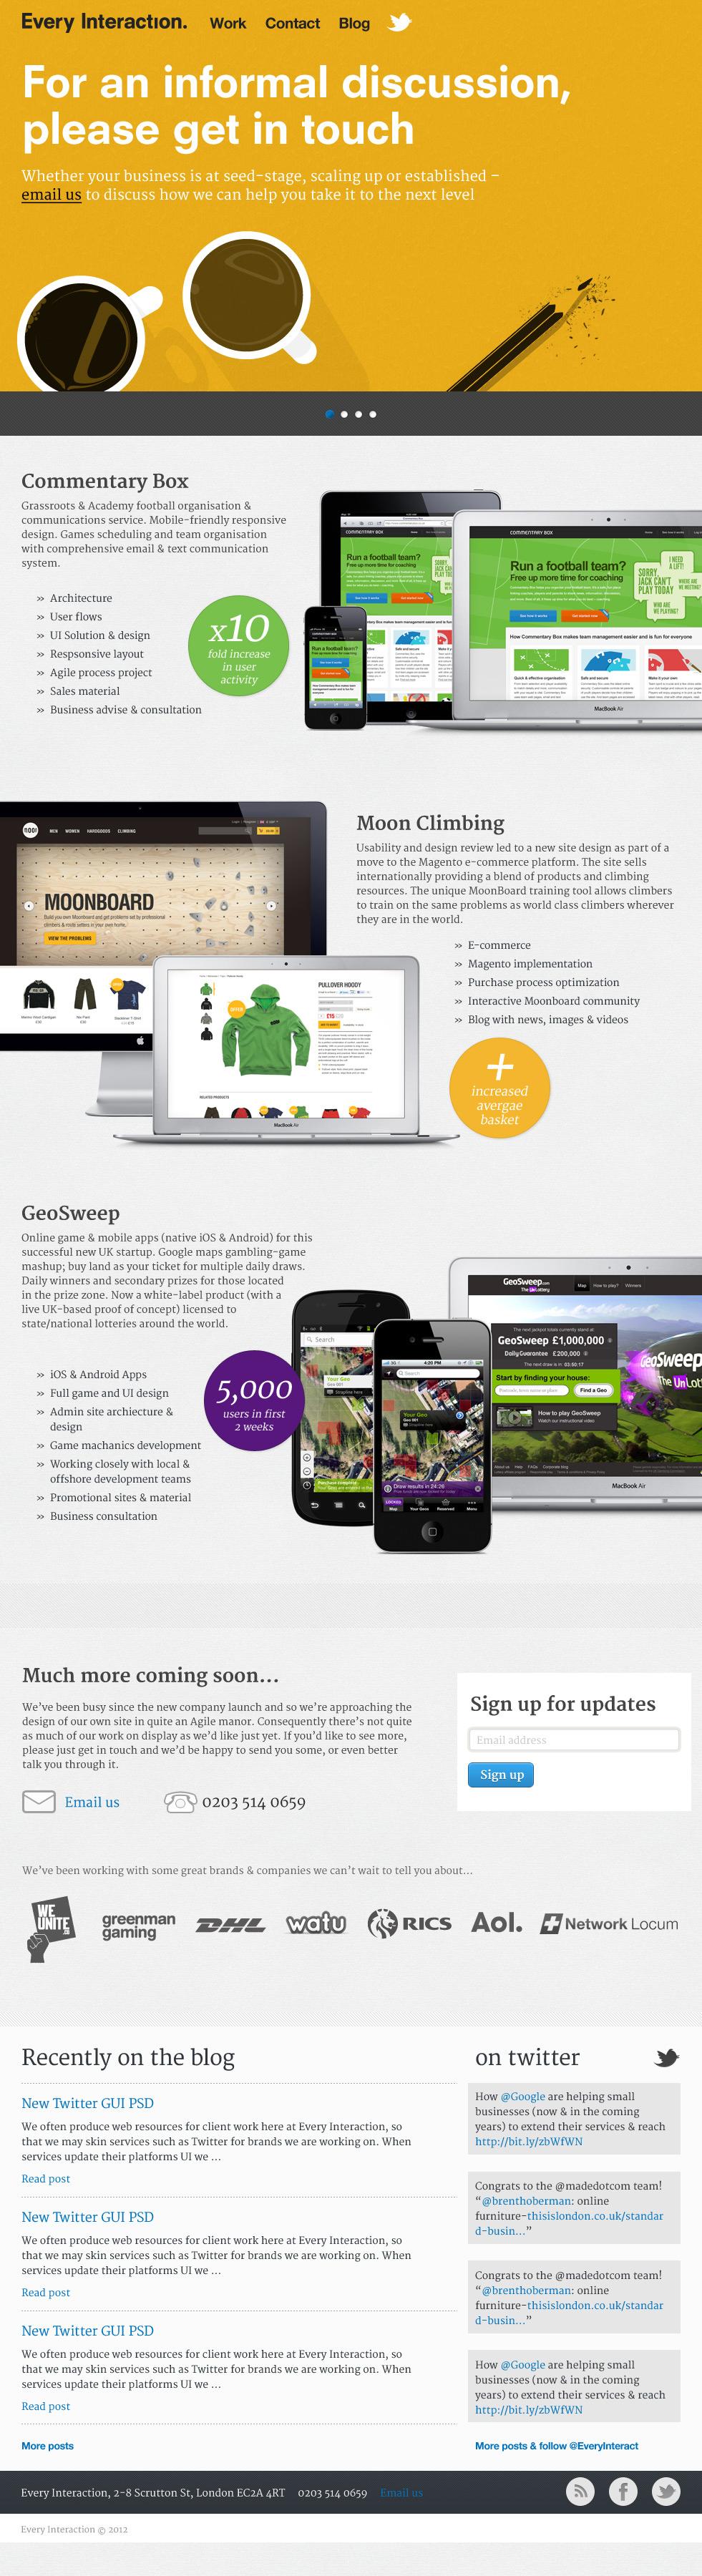 Every Interaction Website Screenshot